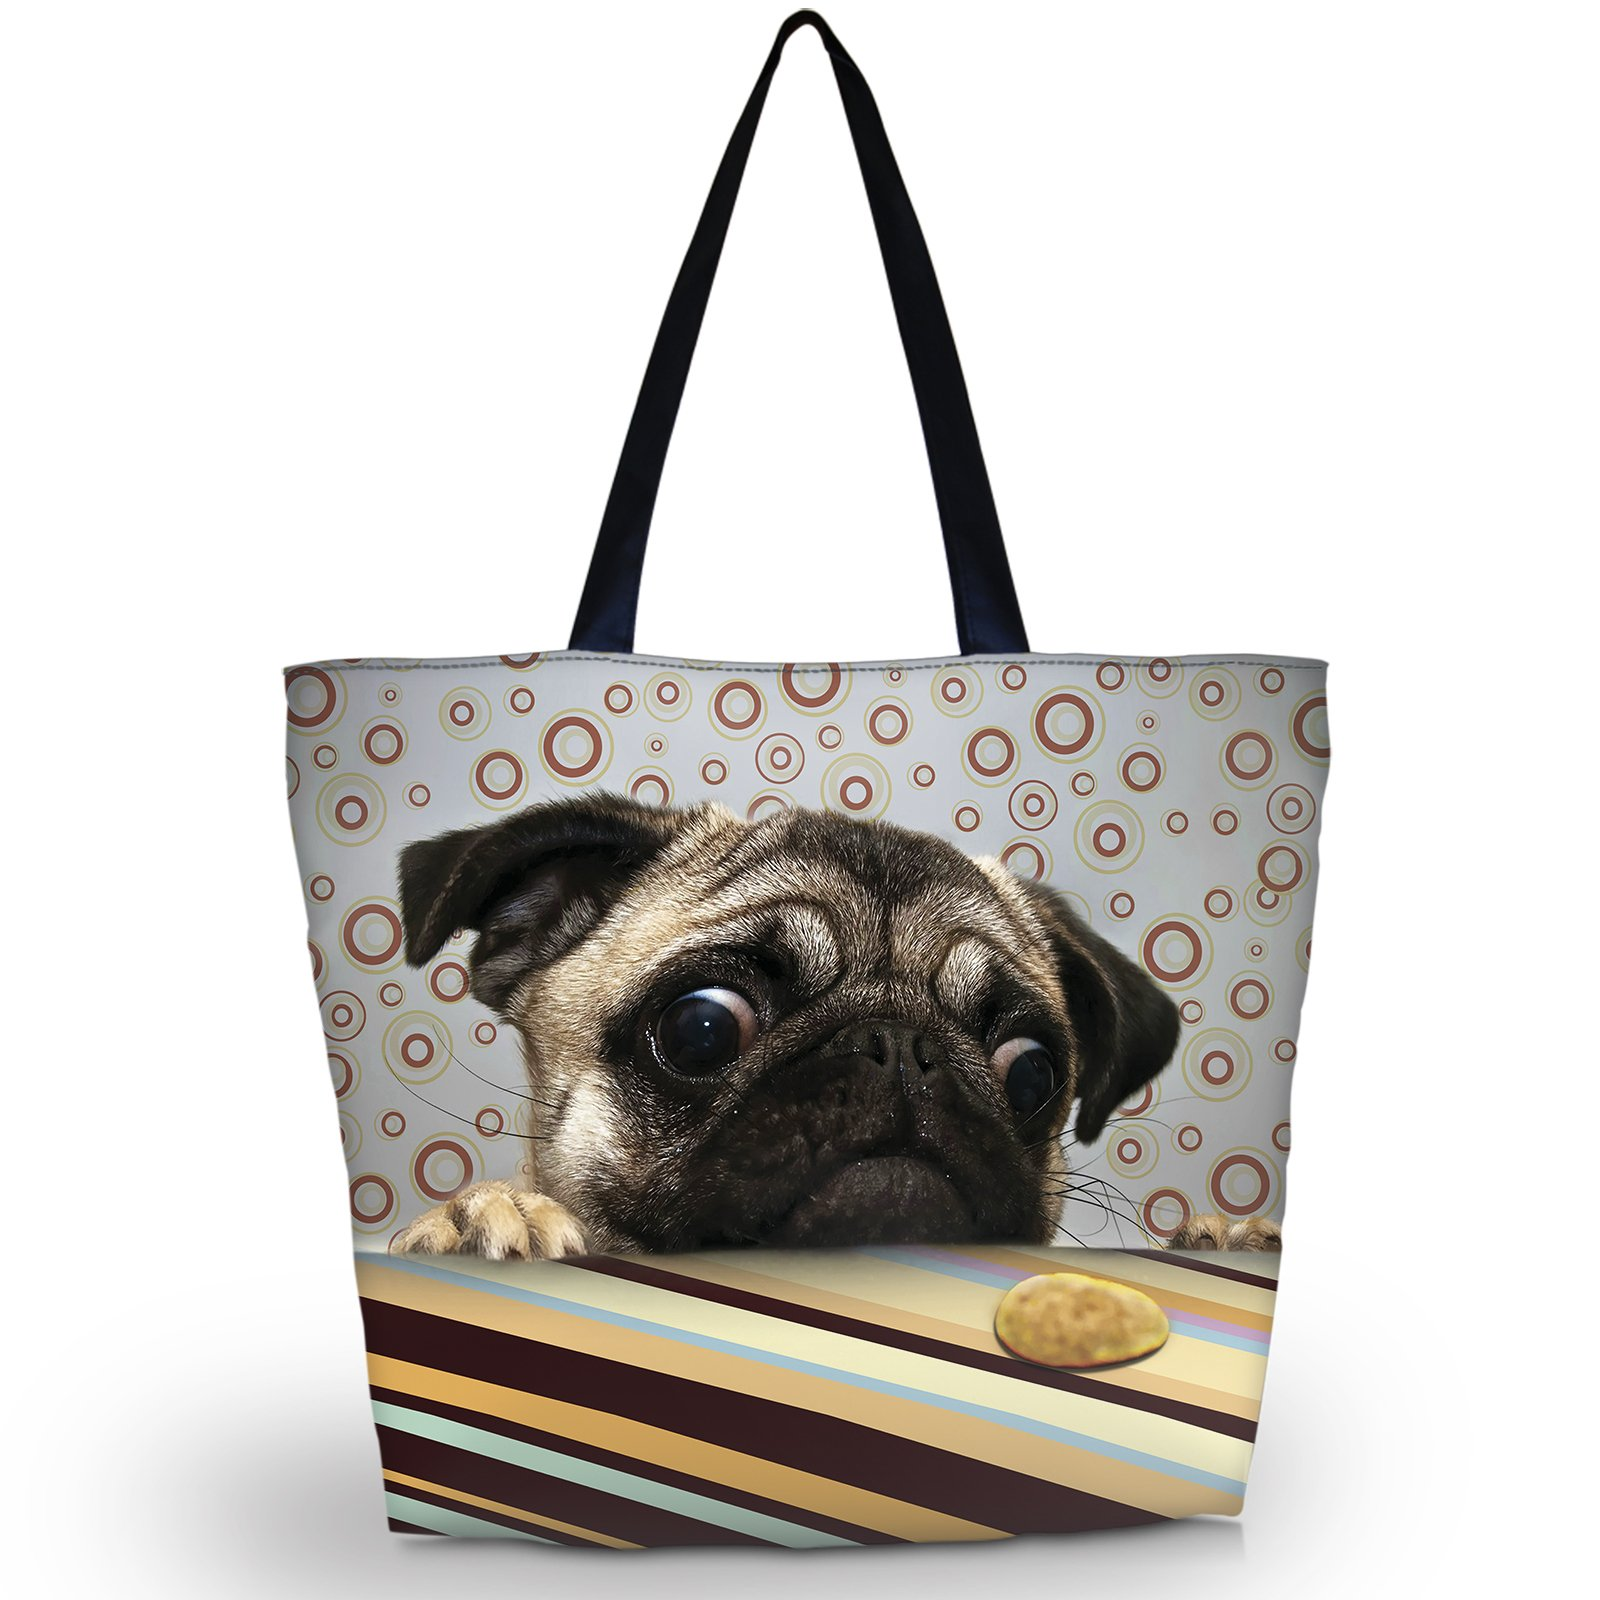 Newplenty Ladies Zippered Light Shoulder Shopping Tote Bag Handbag Beach Satchel (Lazy Pug)